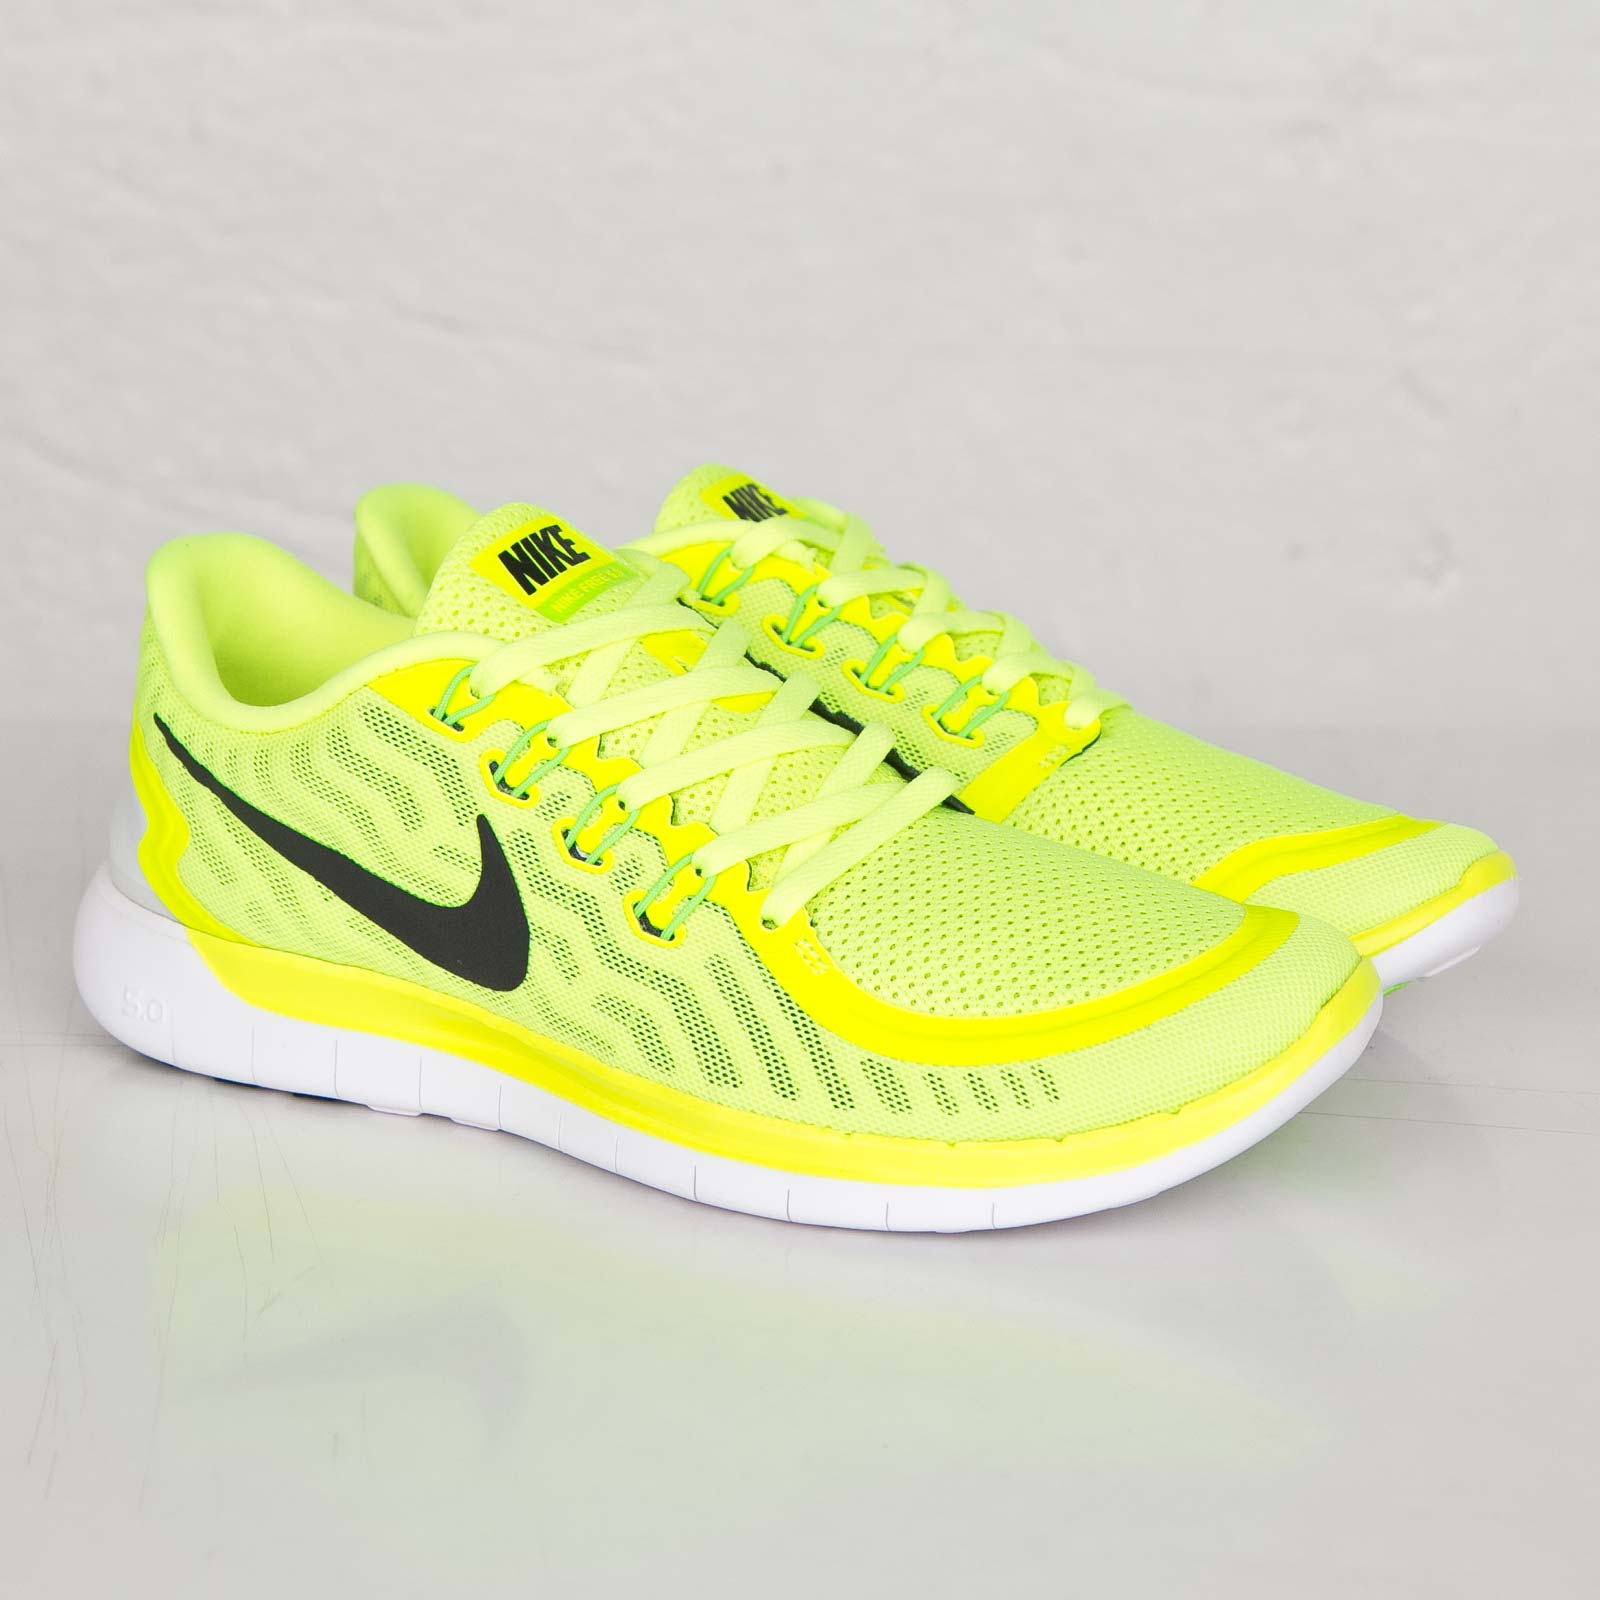 724382 004 Nike Free 5.0 Mens Running Shoes Green